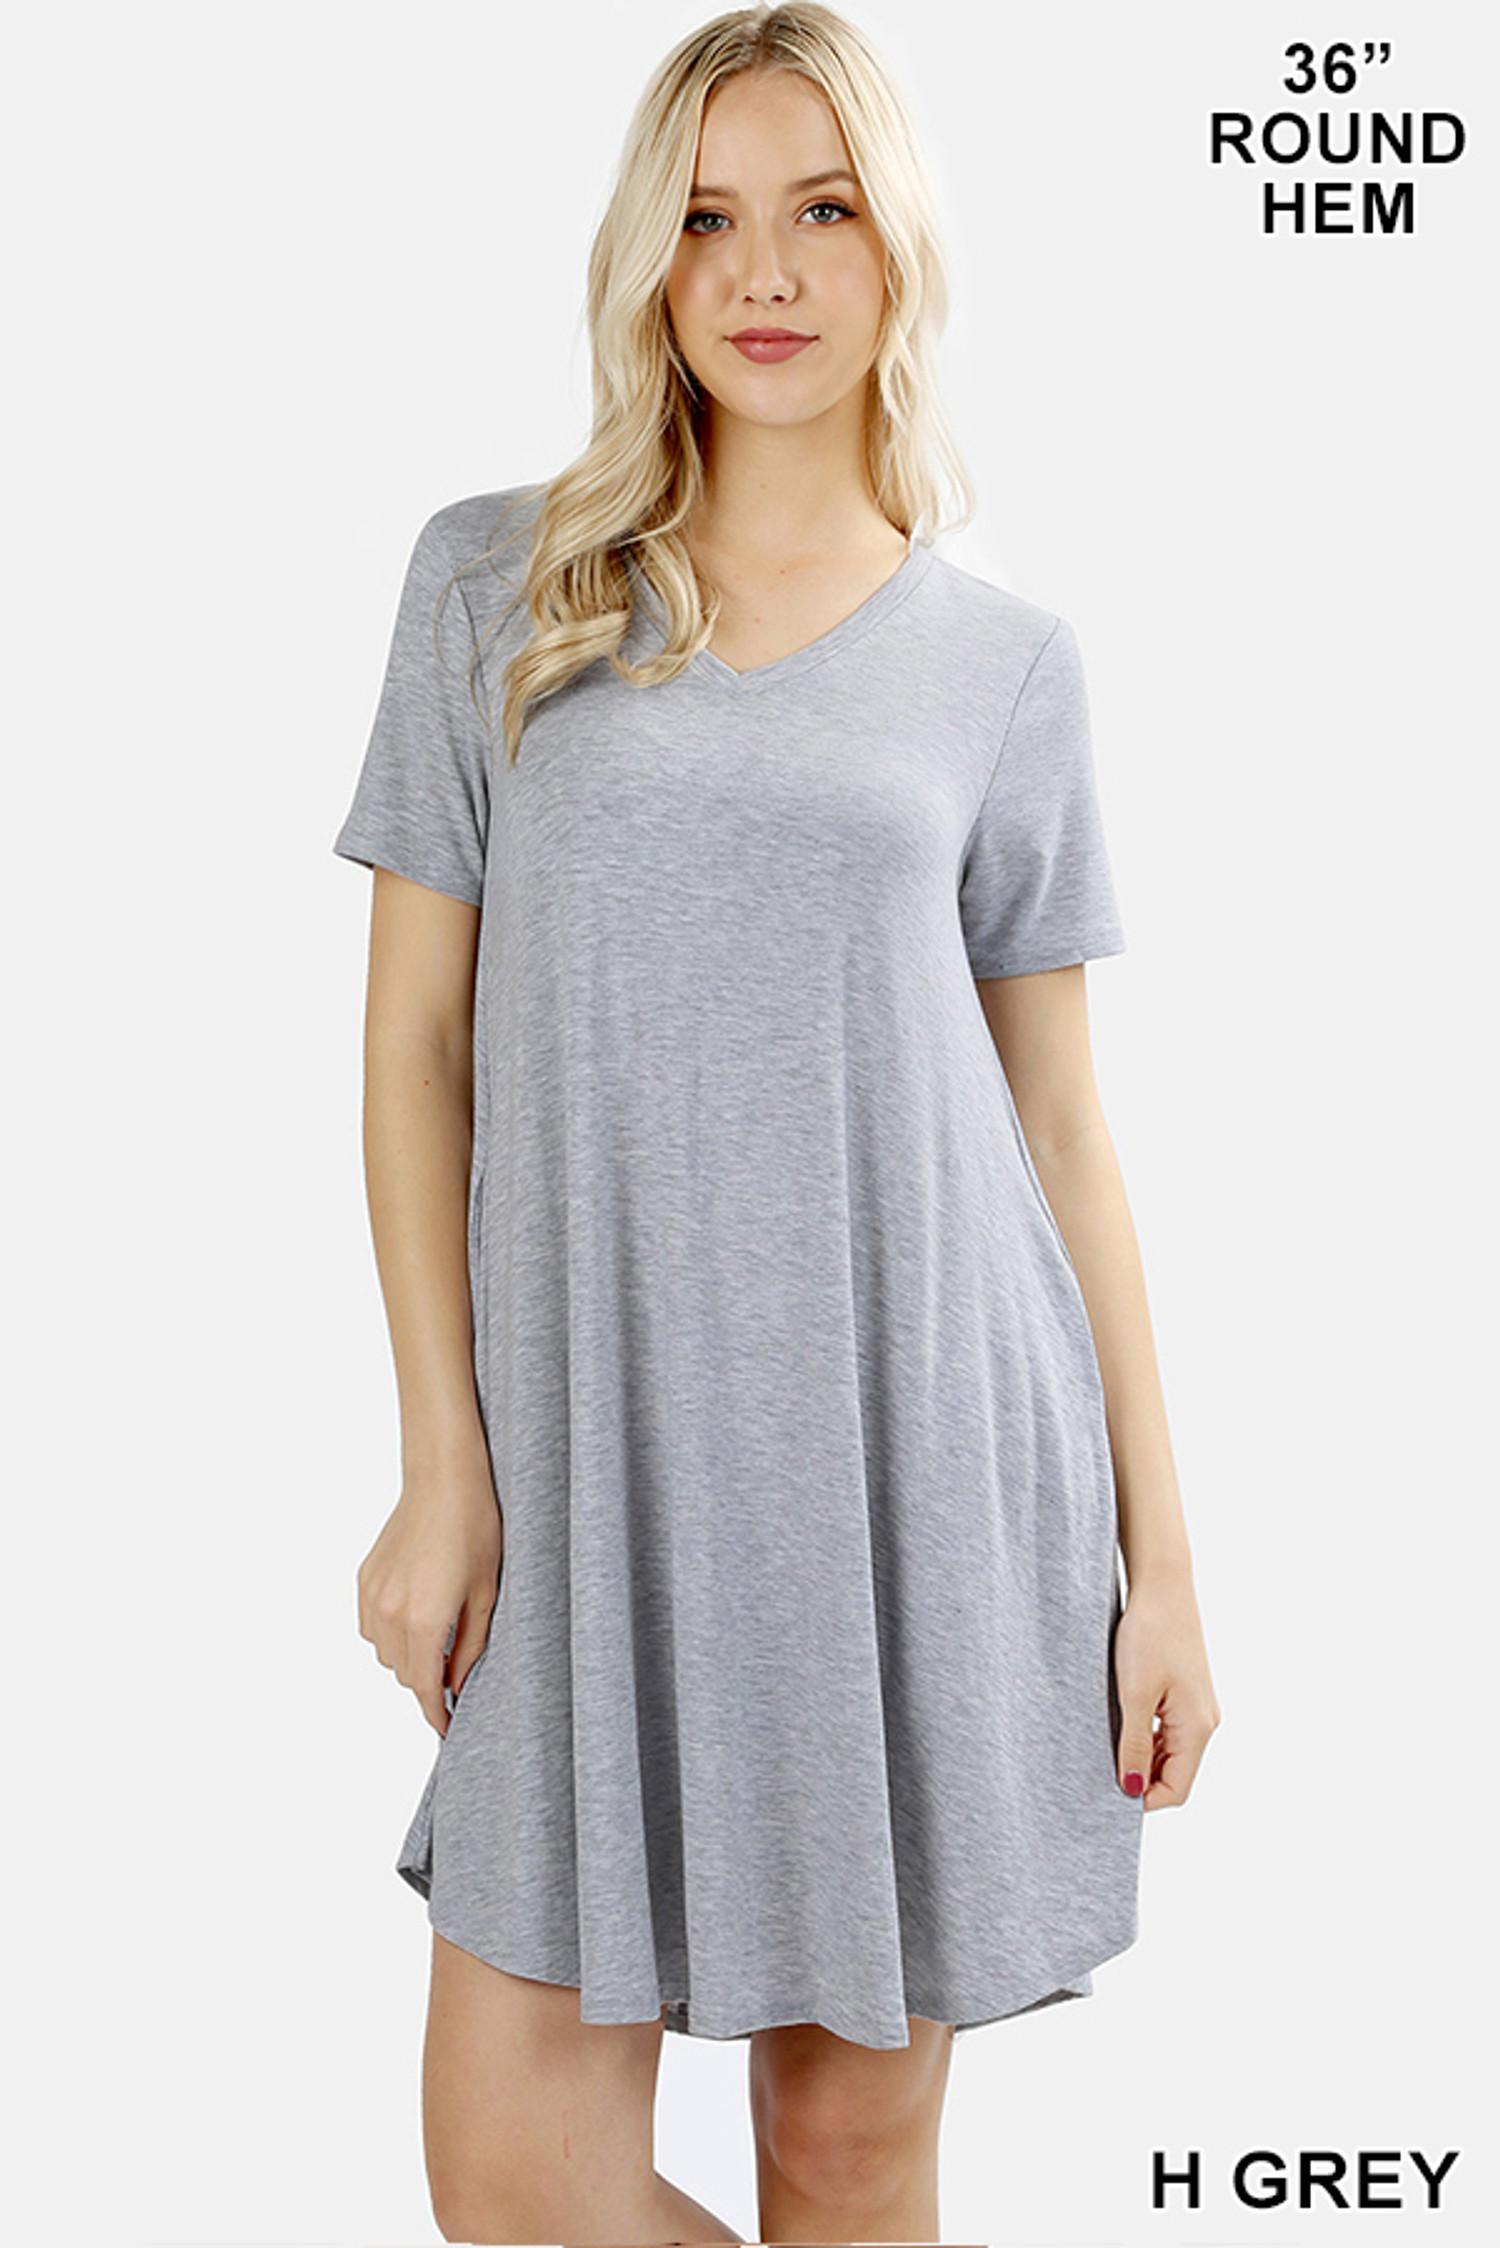 V-Neck Round Hem Short Sleeve Rayon Top with Pockets - 36 Inch